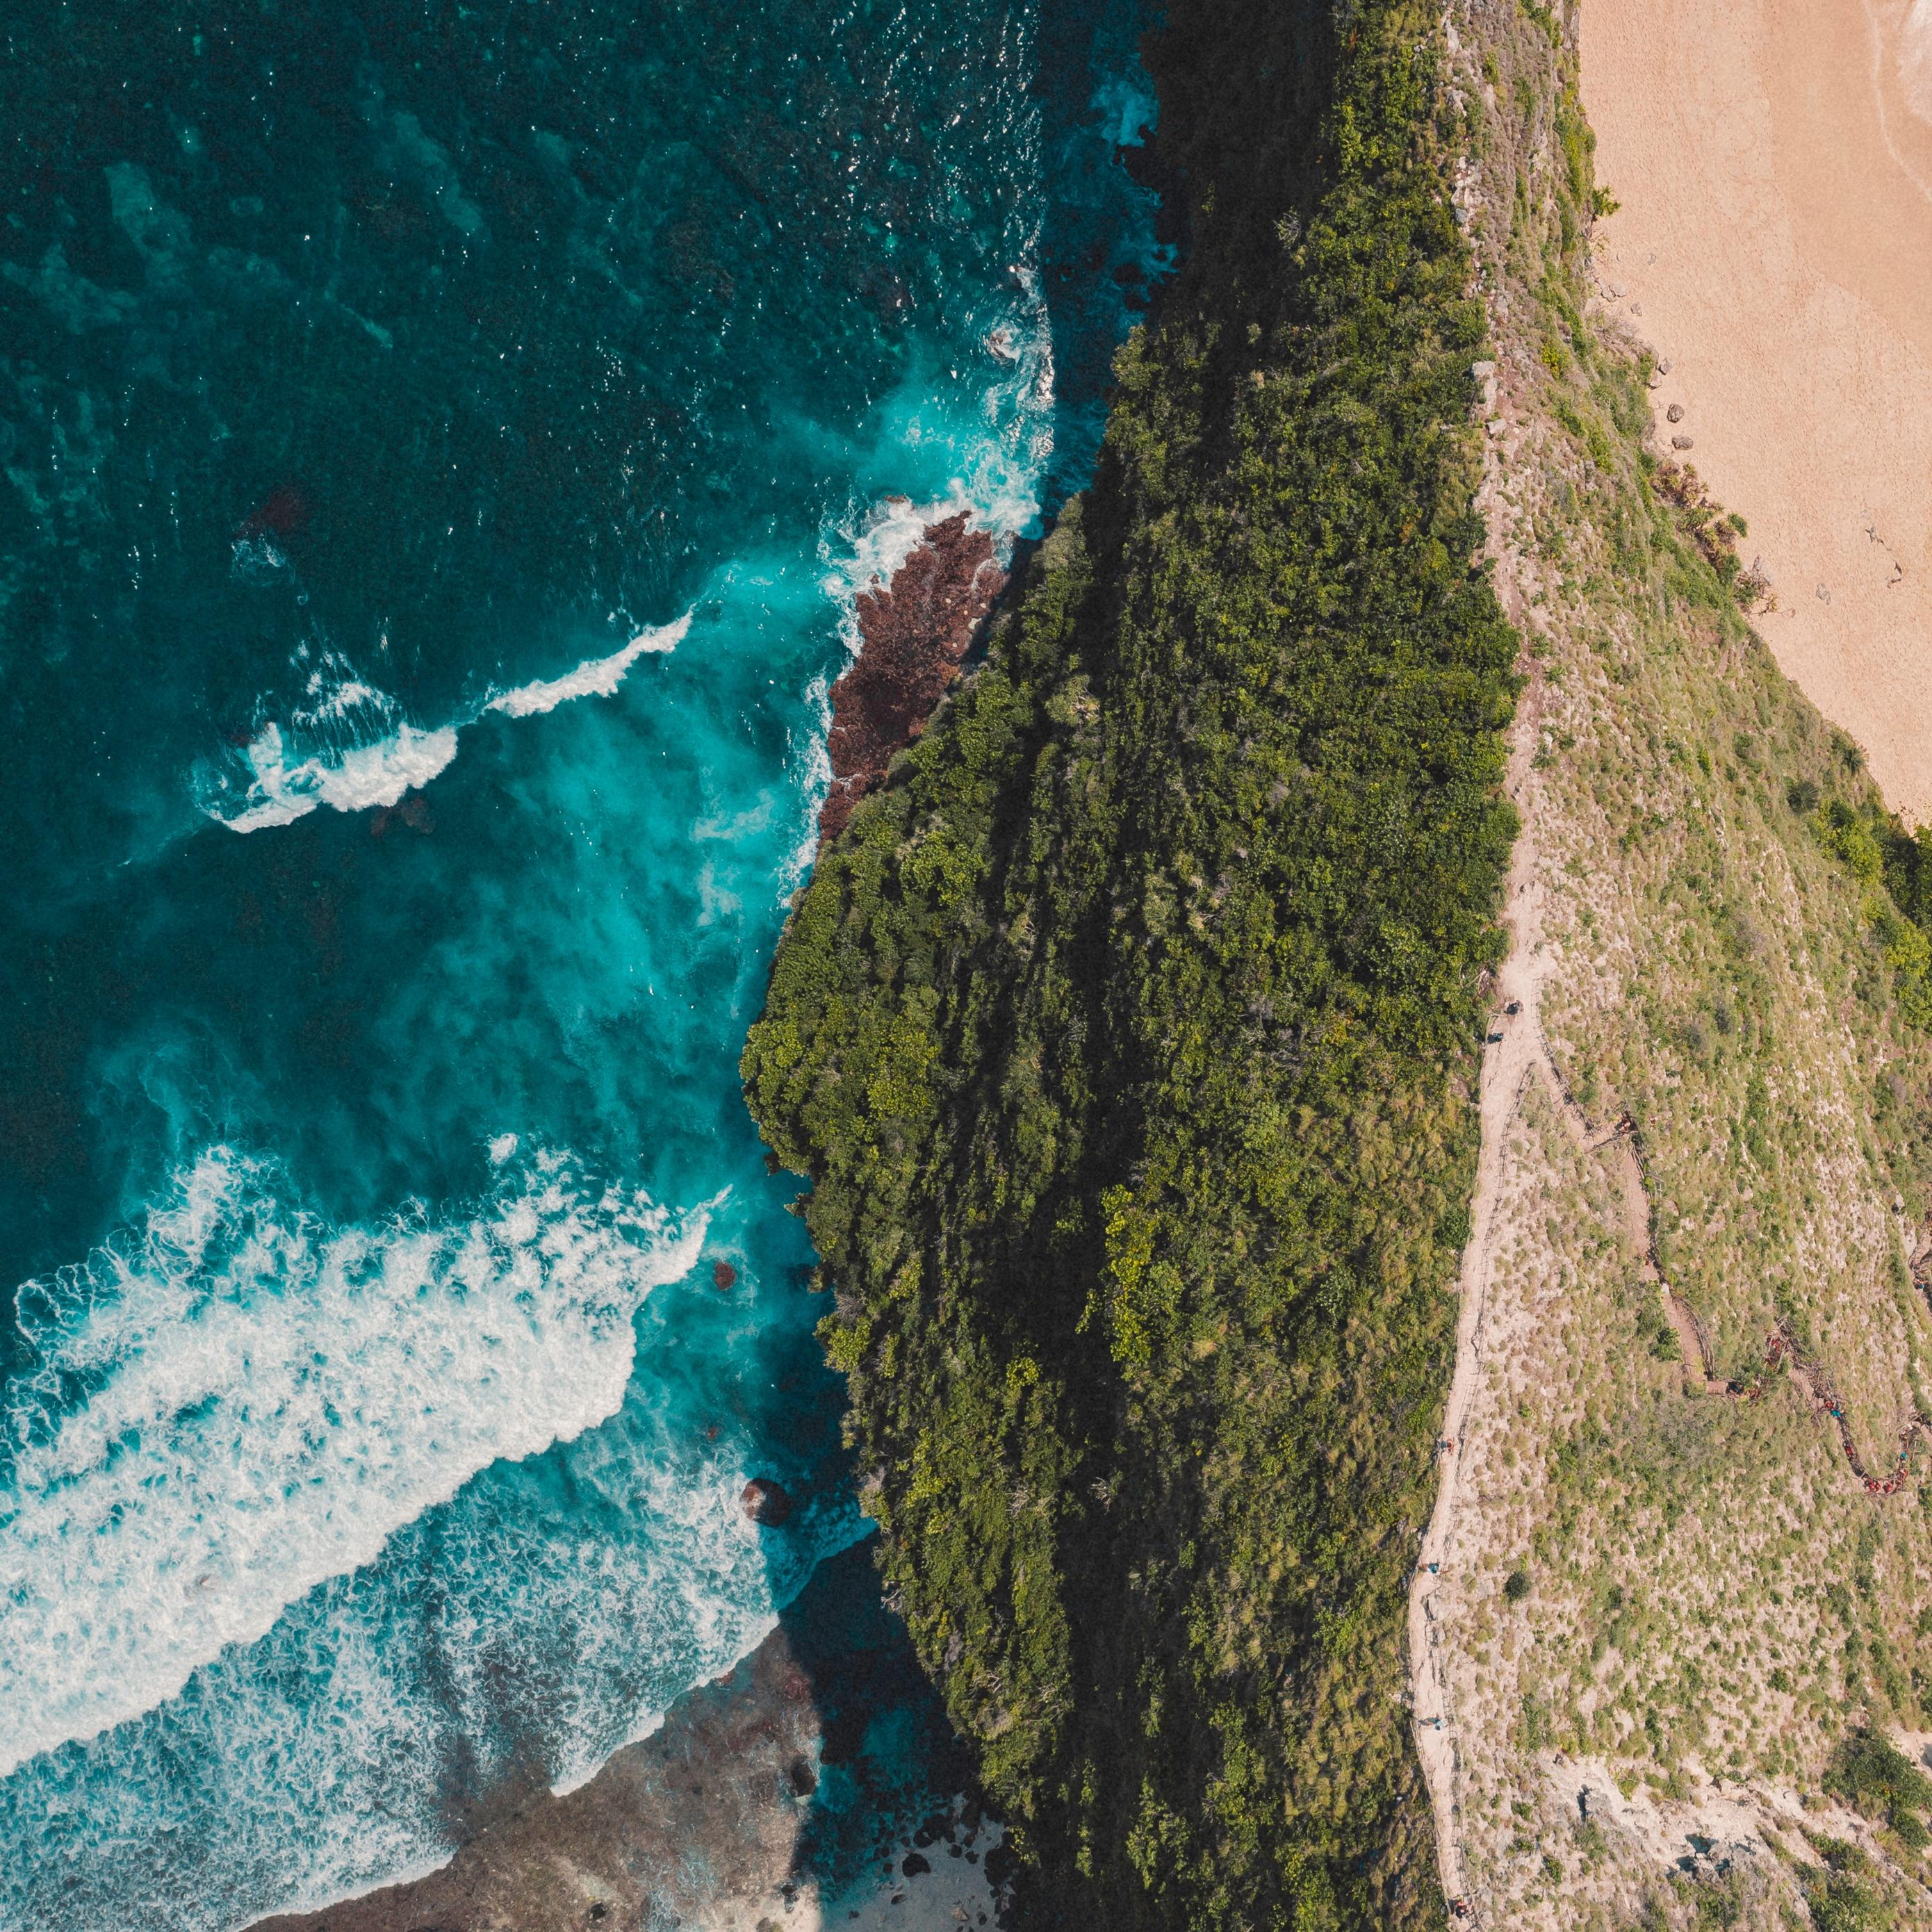 Download wallpaper 2780x2780 ocean island aerial view surf 2780x2780